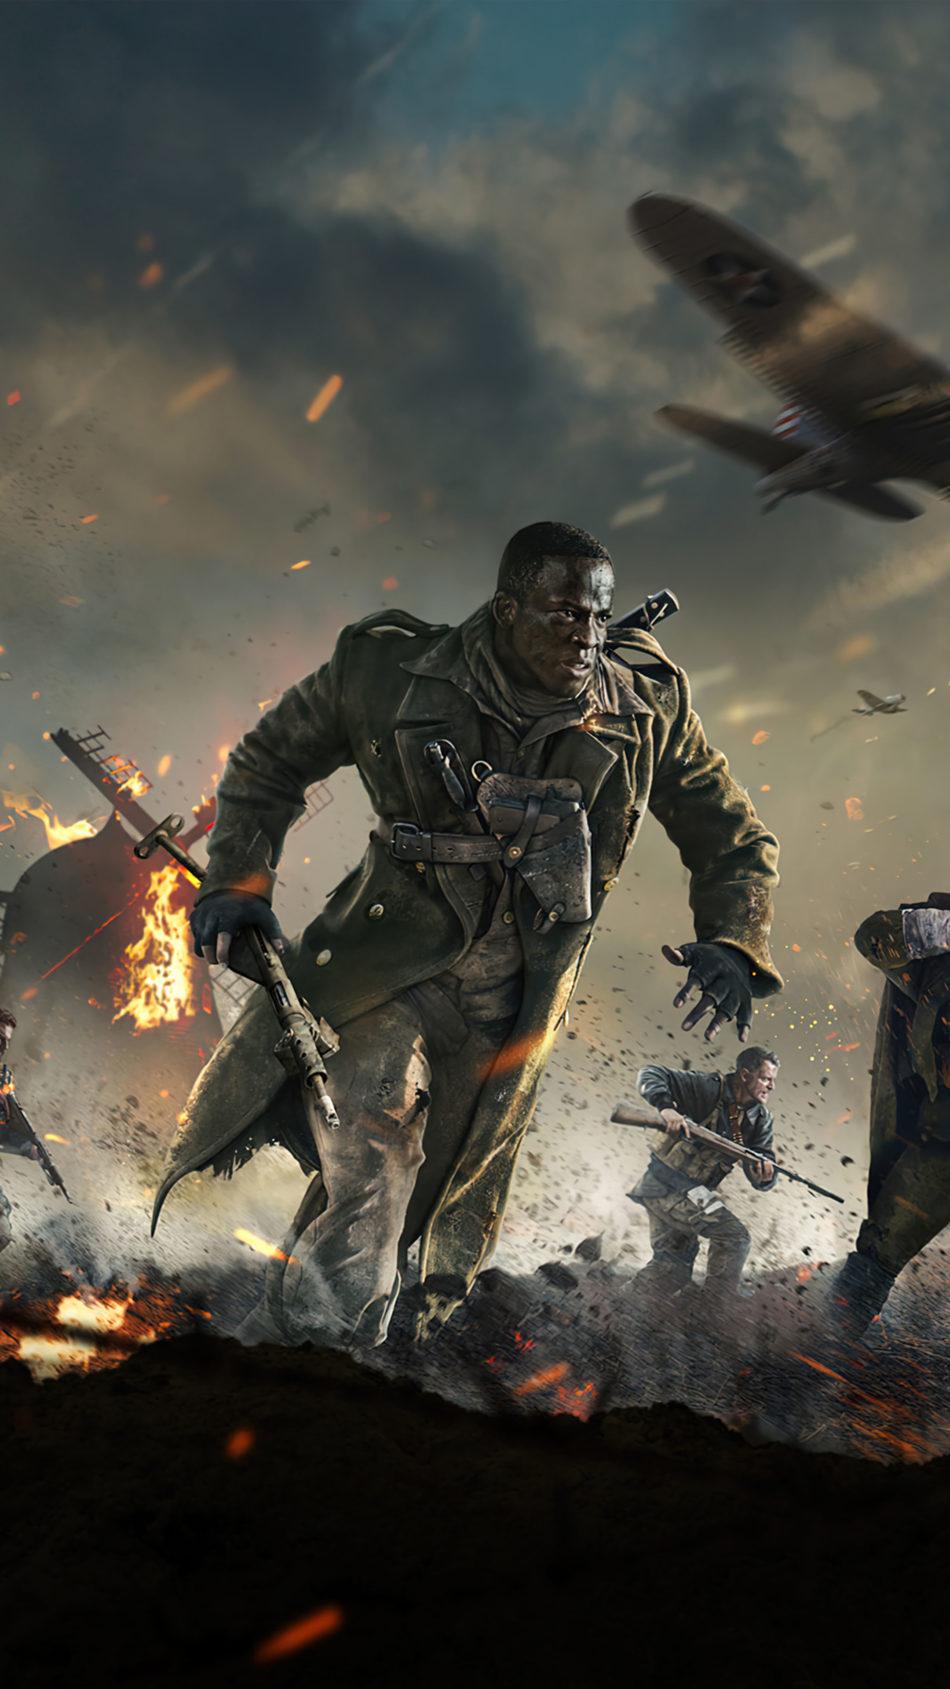 Call of Duty Vanguard Game 2021 4K Ultra HD Mobile Wallpaper